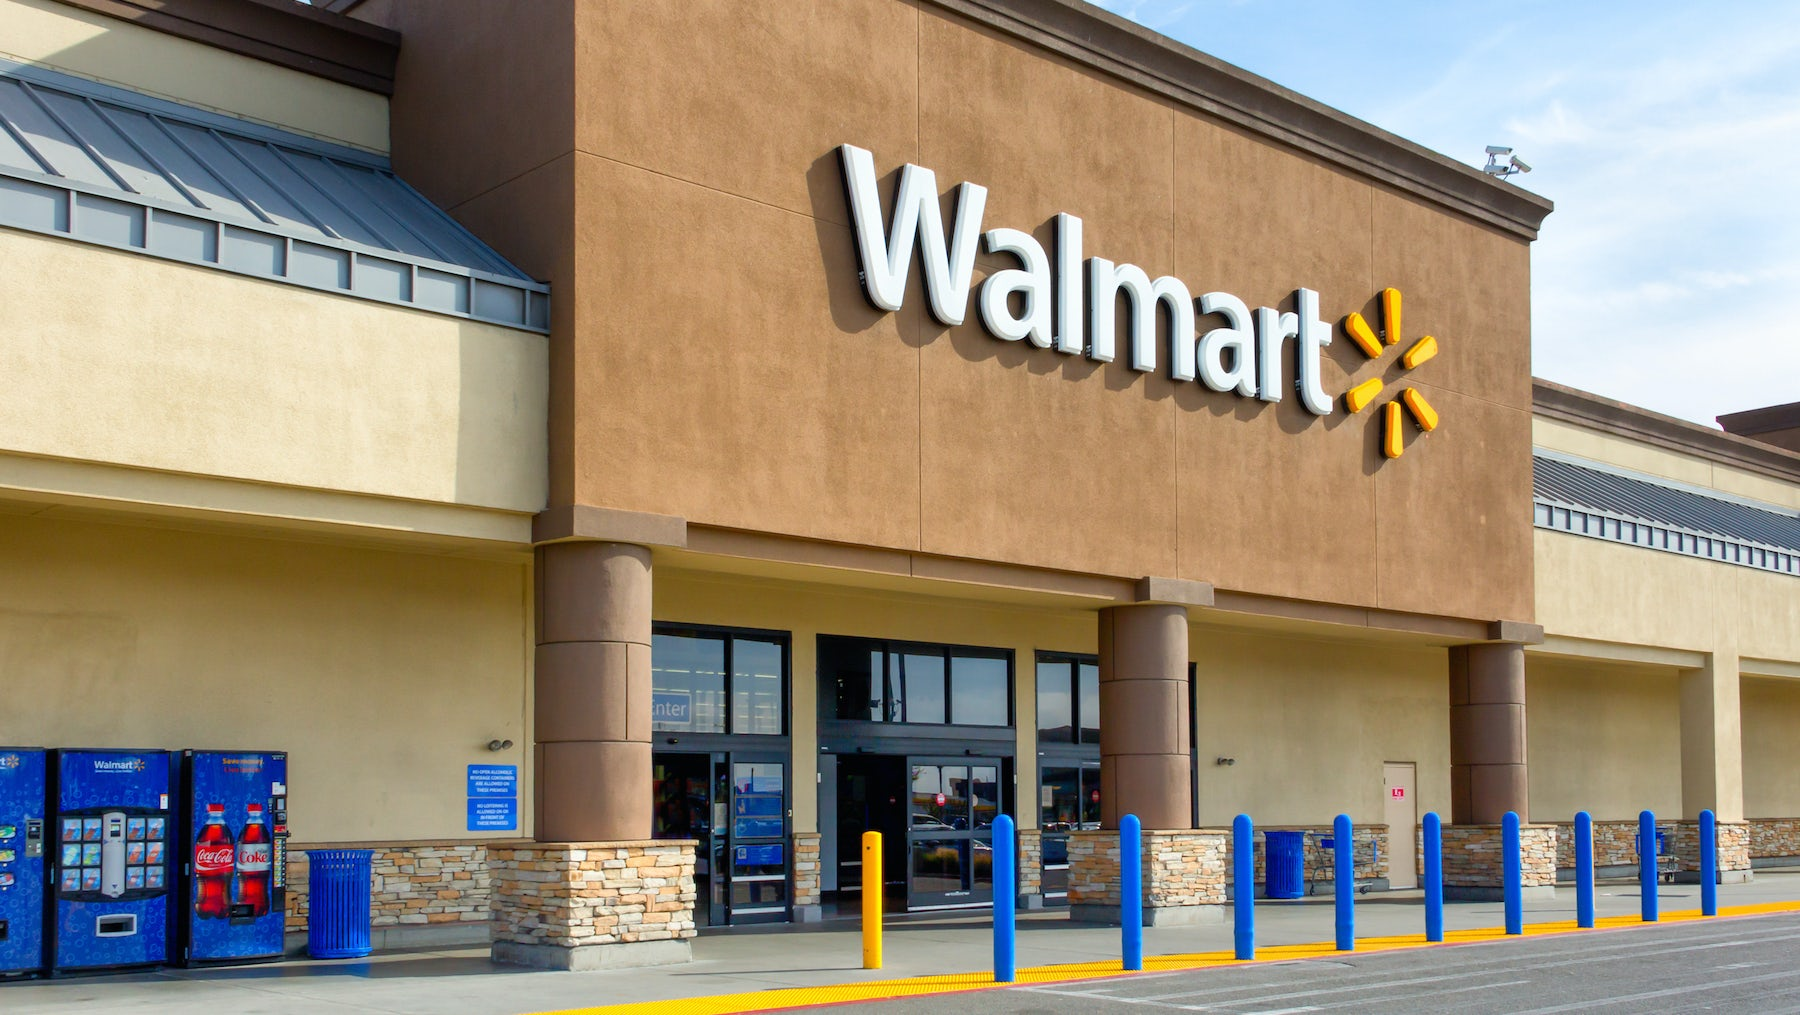 Walmart store front   Source: Shutterstock